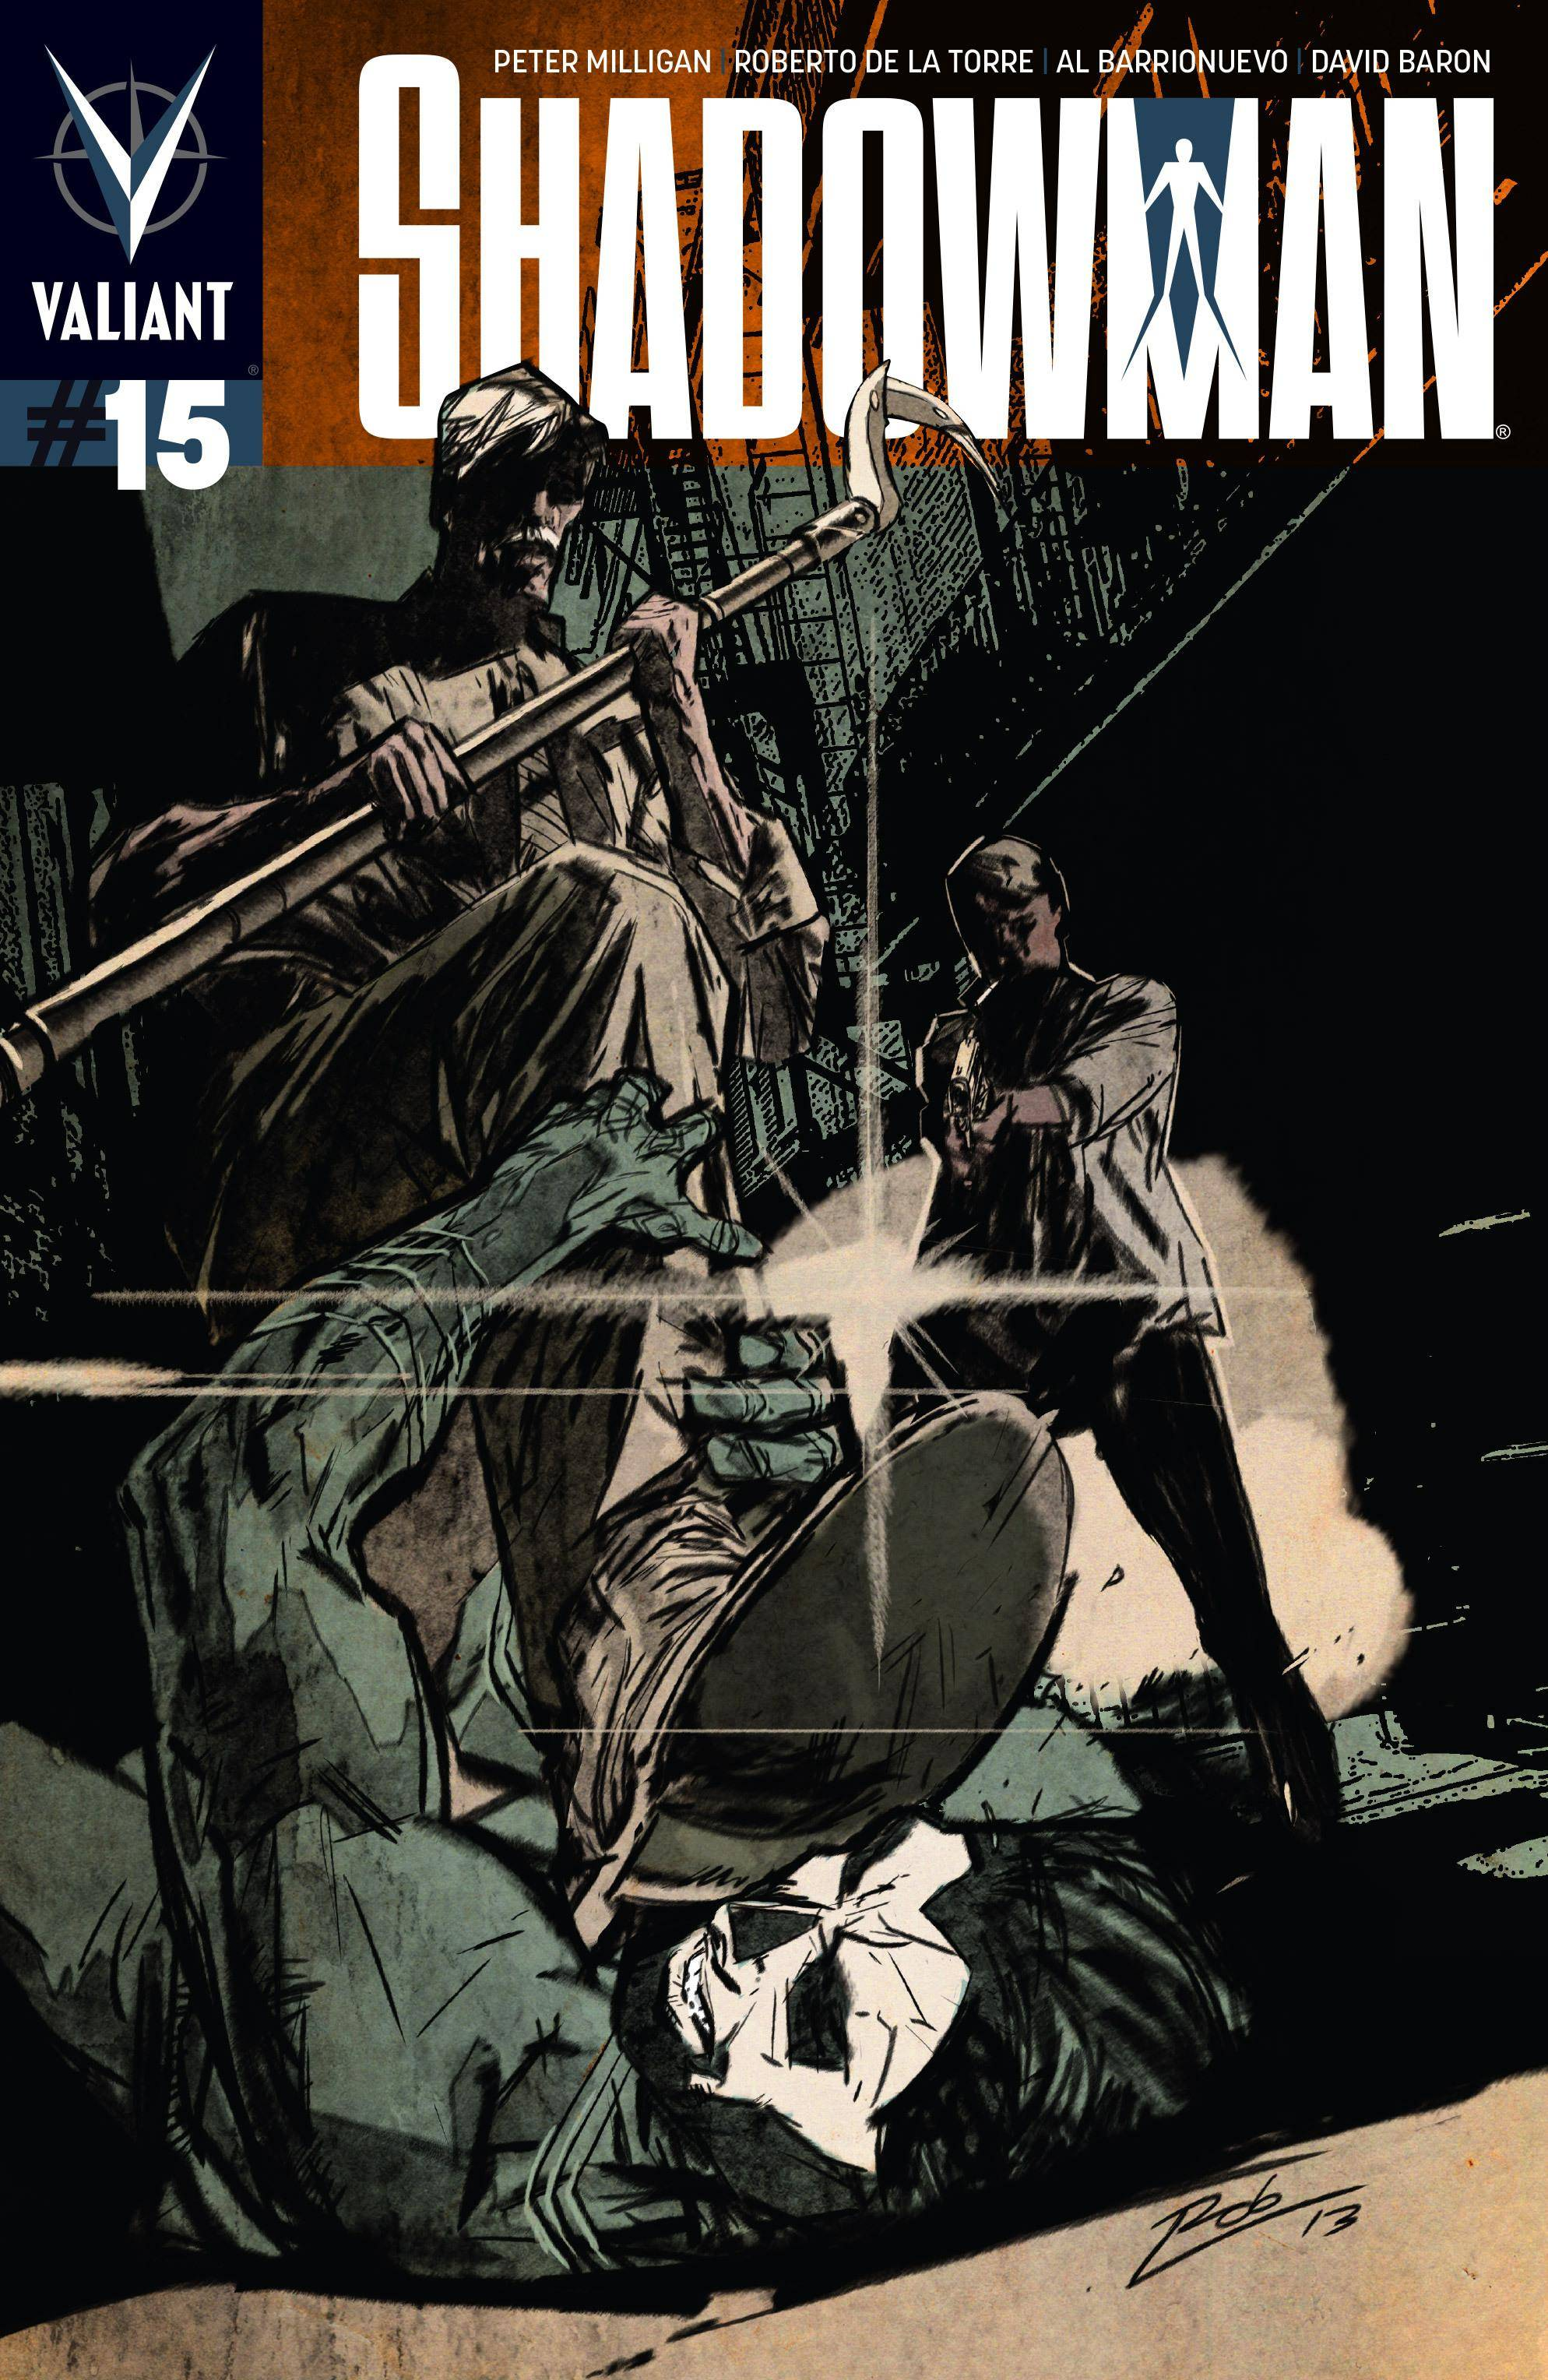 For Ochimusha -  Shadowman 015 2014 digital Minutemen-Spaztastic cbr